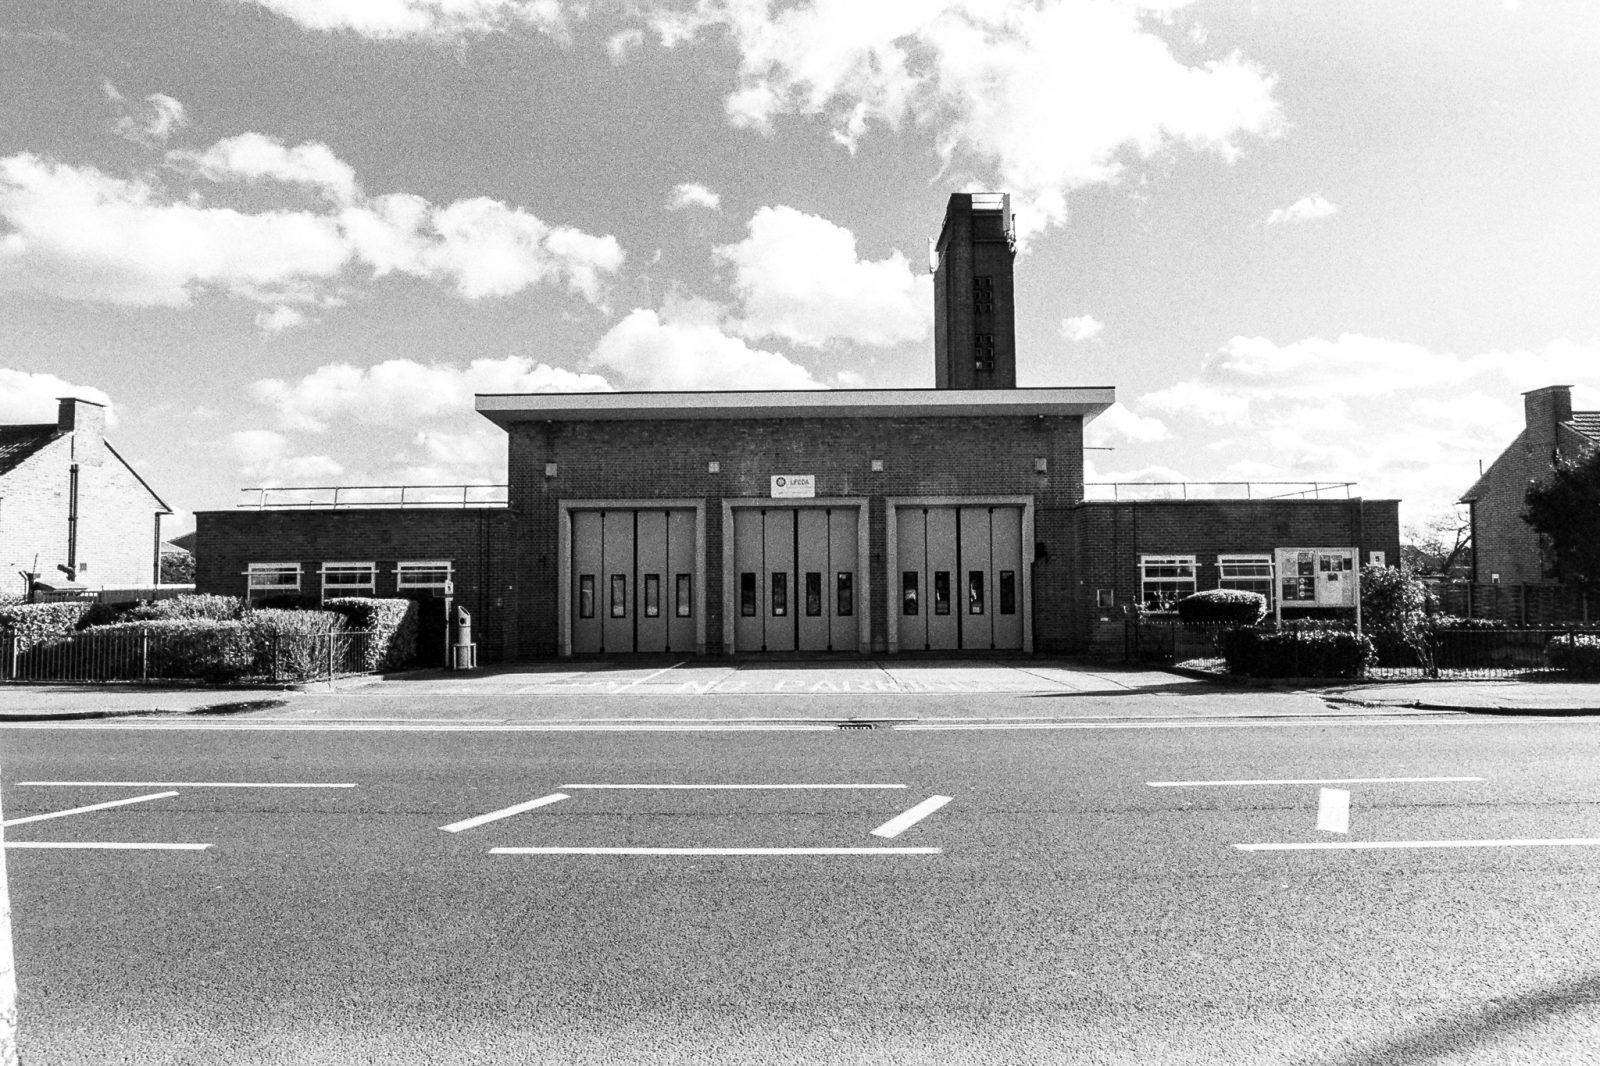 Hainault Fire Station